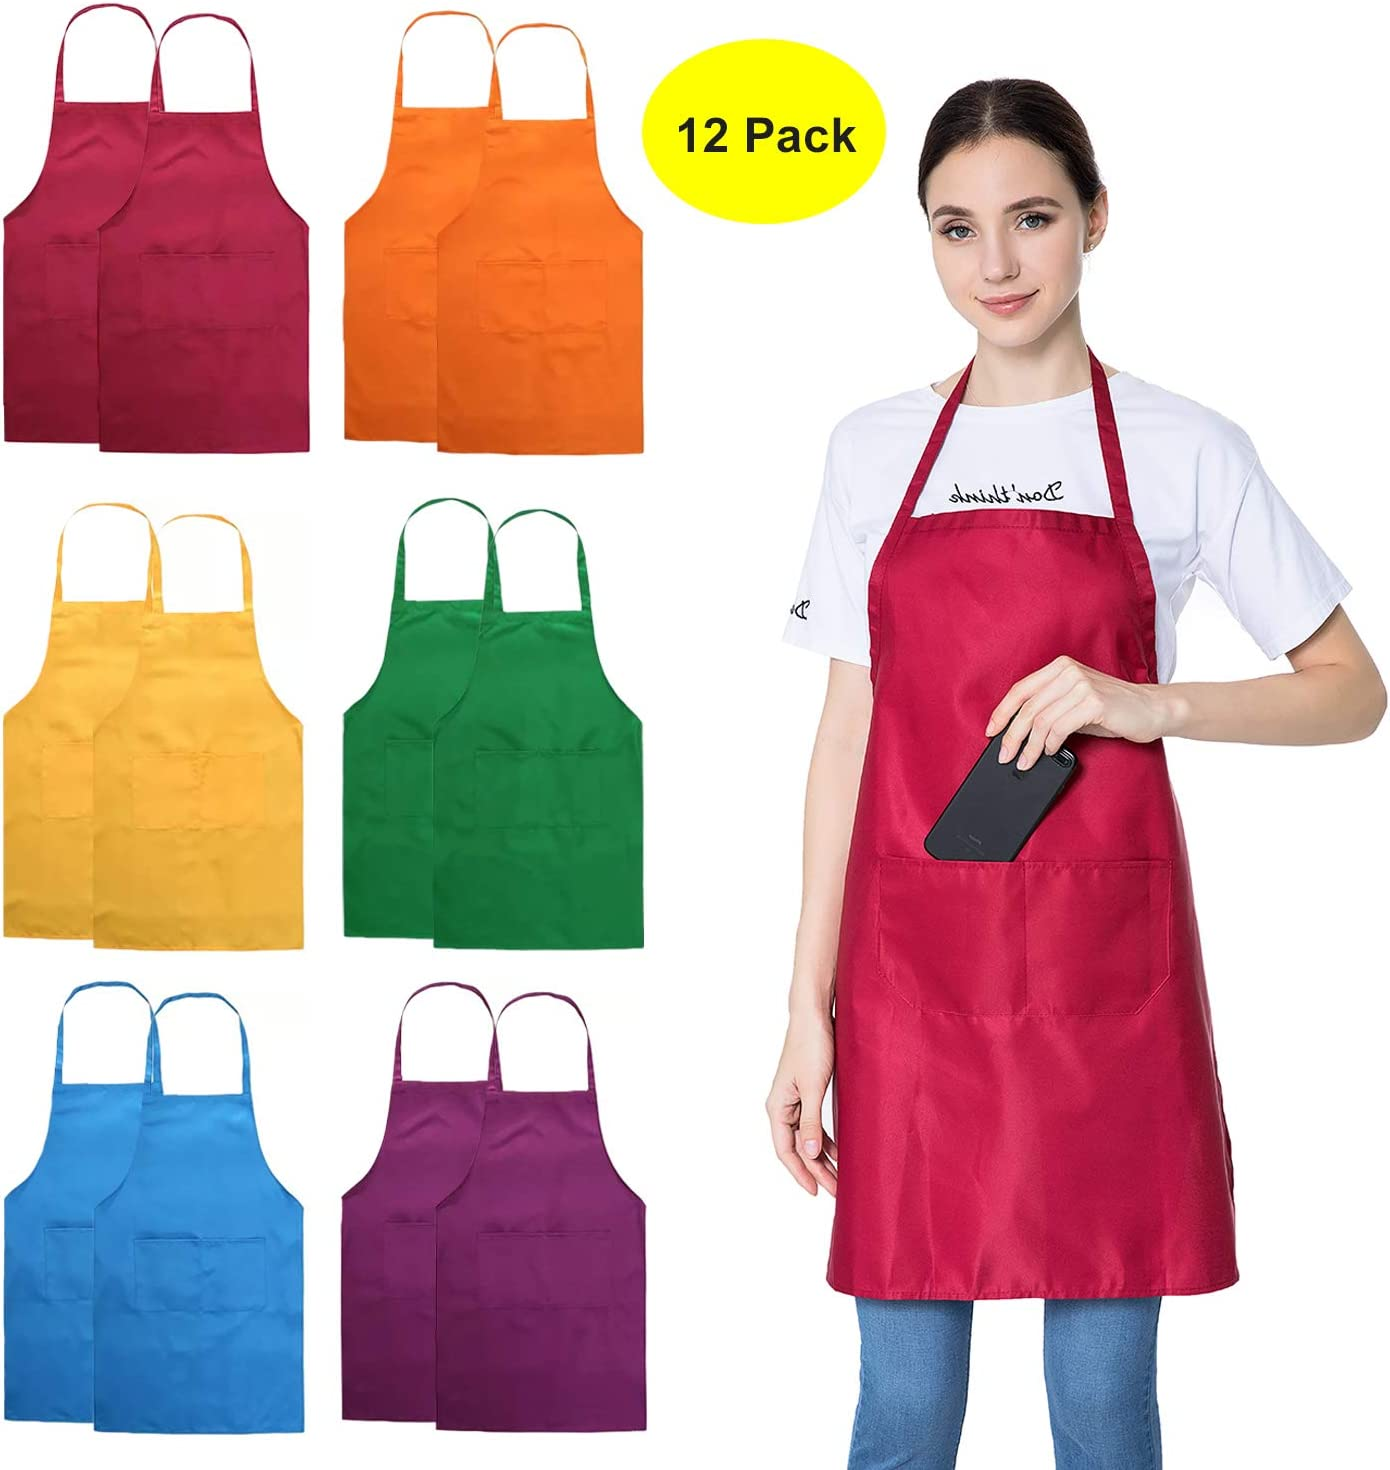 Simple Unisex Denim Apron Painting Kitchen Cooking Restaurant Work Apron SL